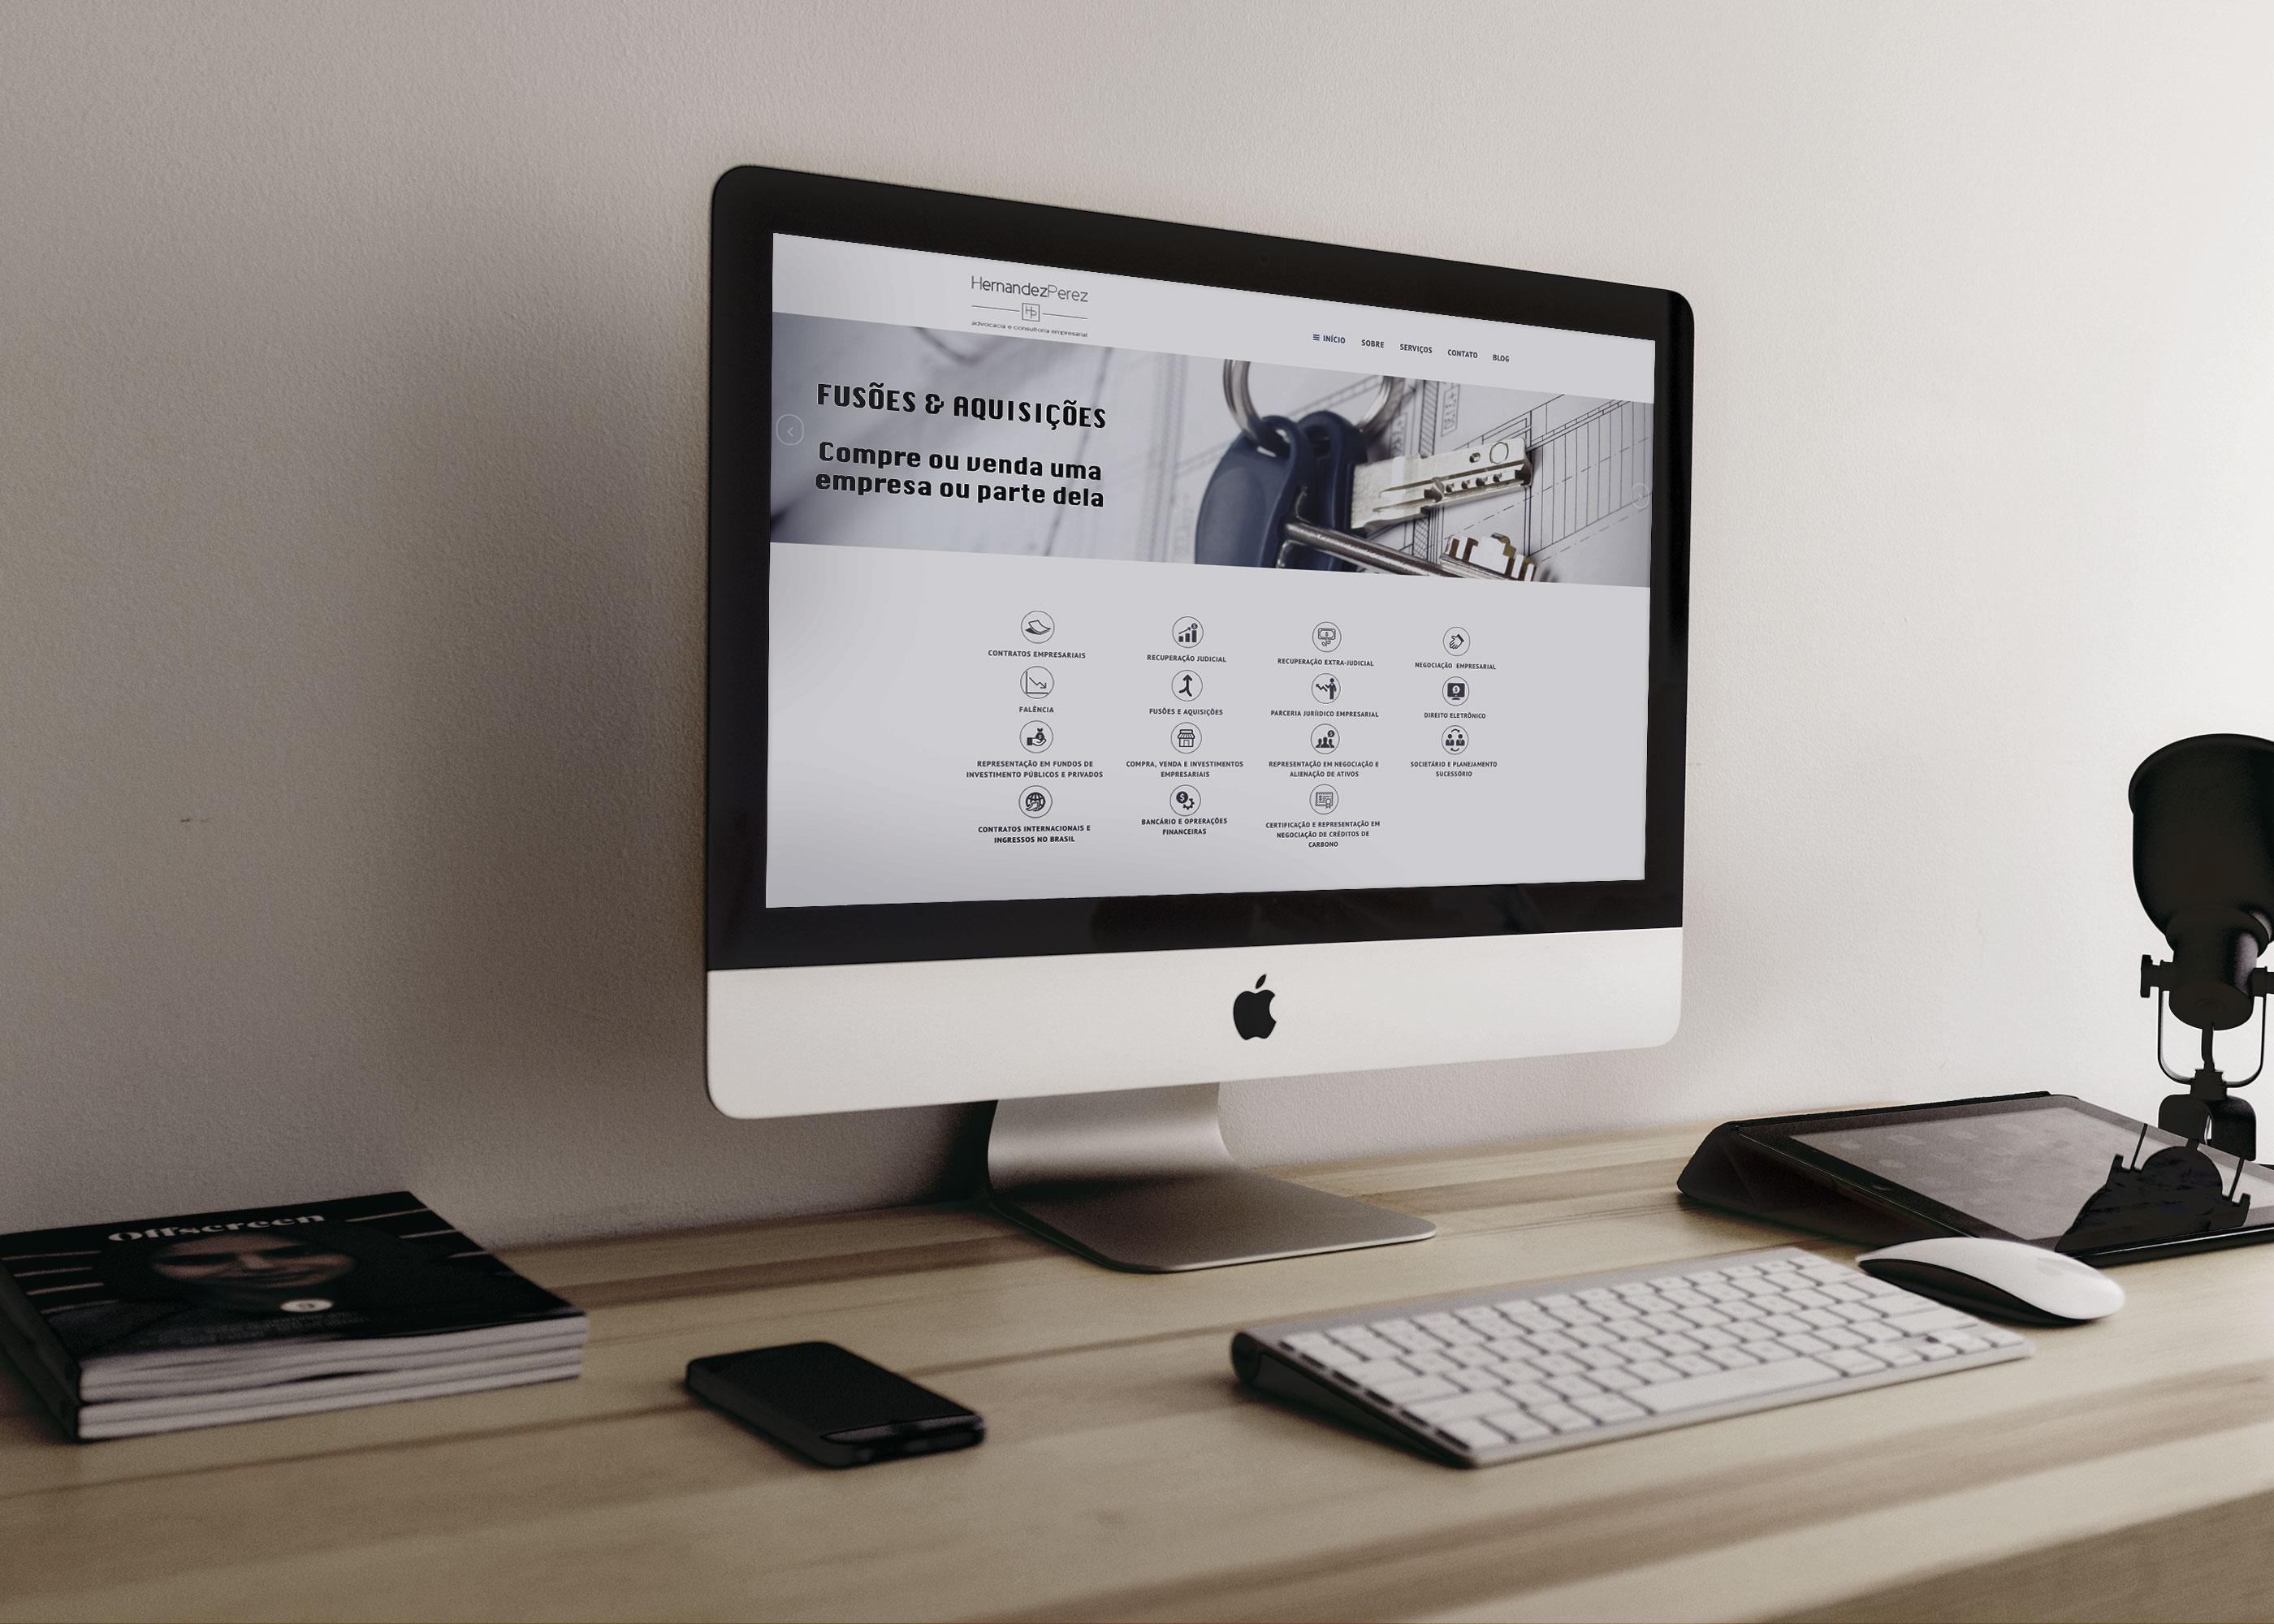 Web site - Hernandez Perez Advocacia e consultoria Empresarial